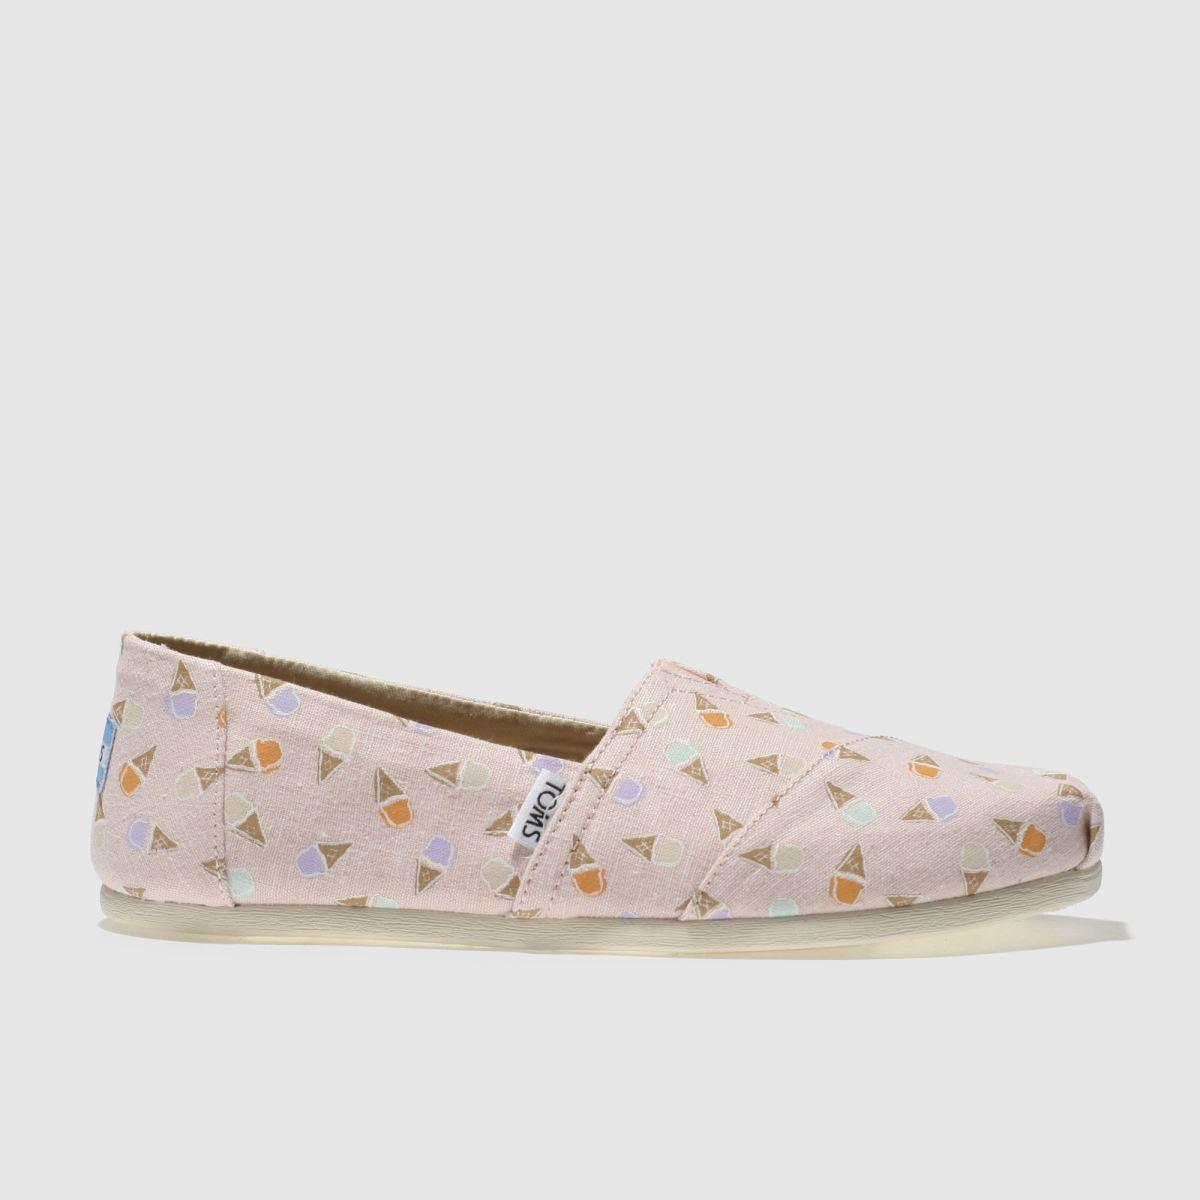 Toms Pale Pink Alpargata Ice Cream Cones Flat Shoes